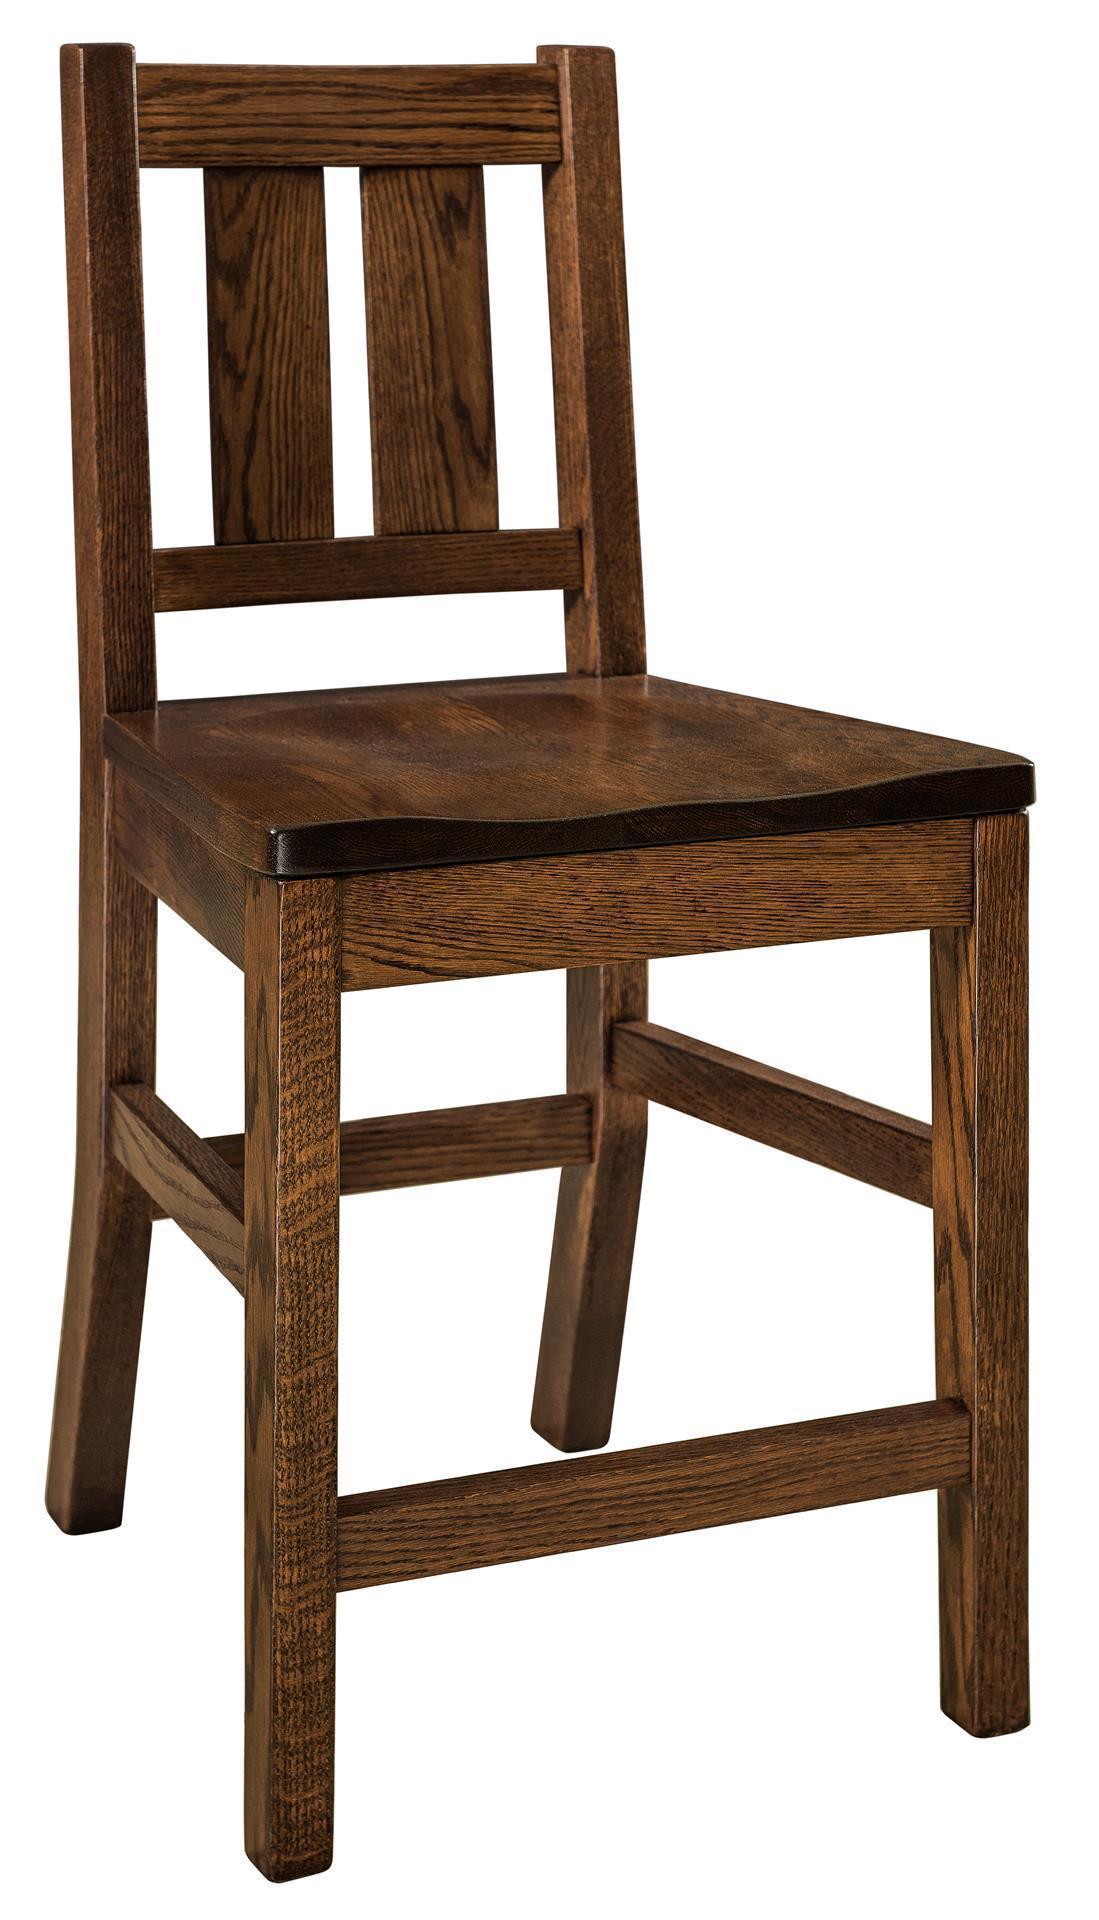 Awe Inspiring Amish Knoxville Bar Stool Beatyapartments Chair Design Images Beatyapartmentscom